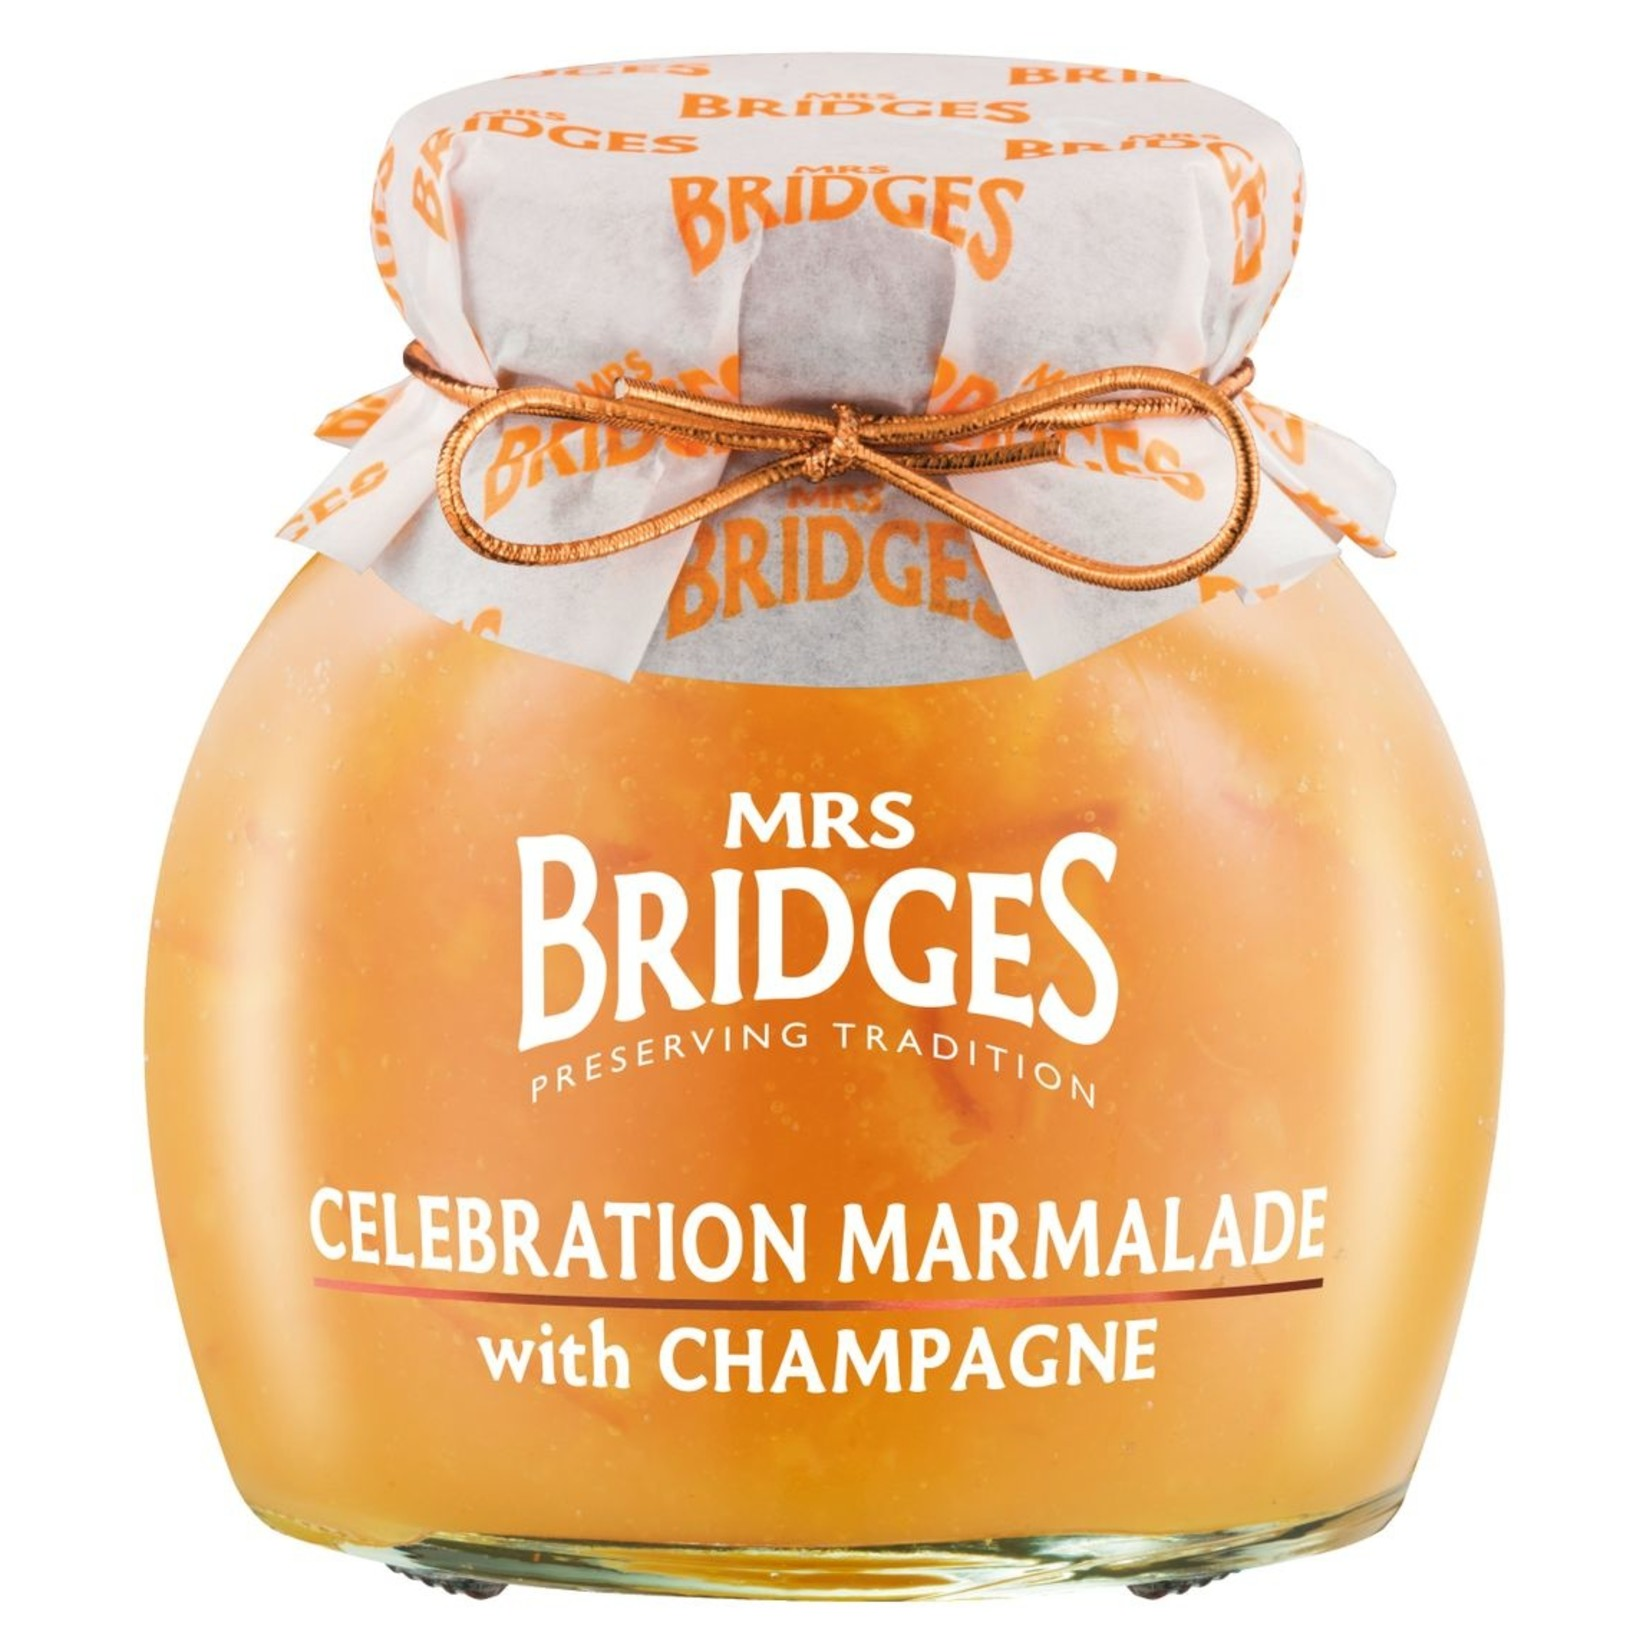 Mrs. Bridges Celebration Marmalade with Champagne